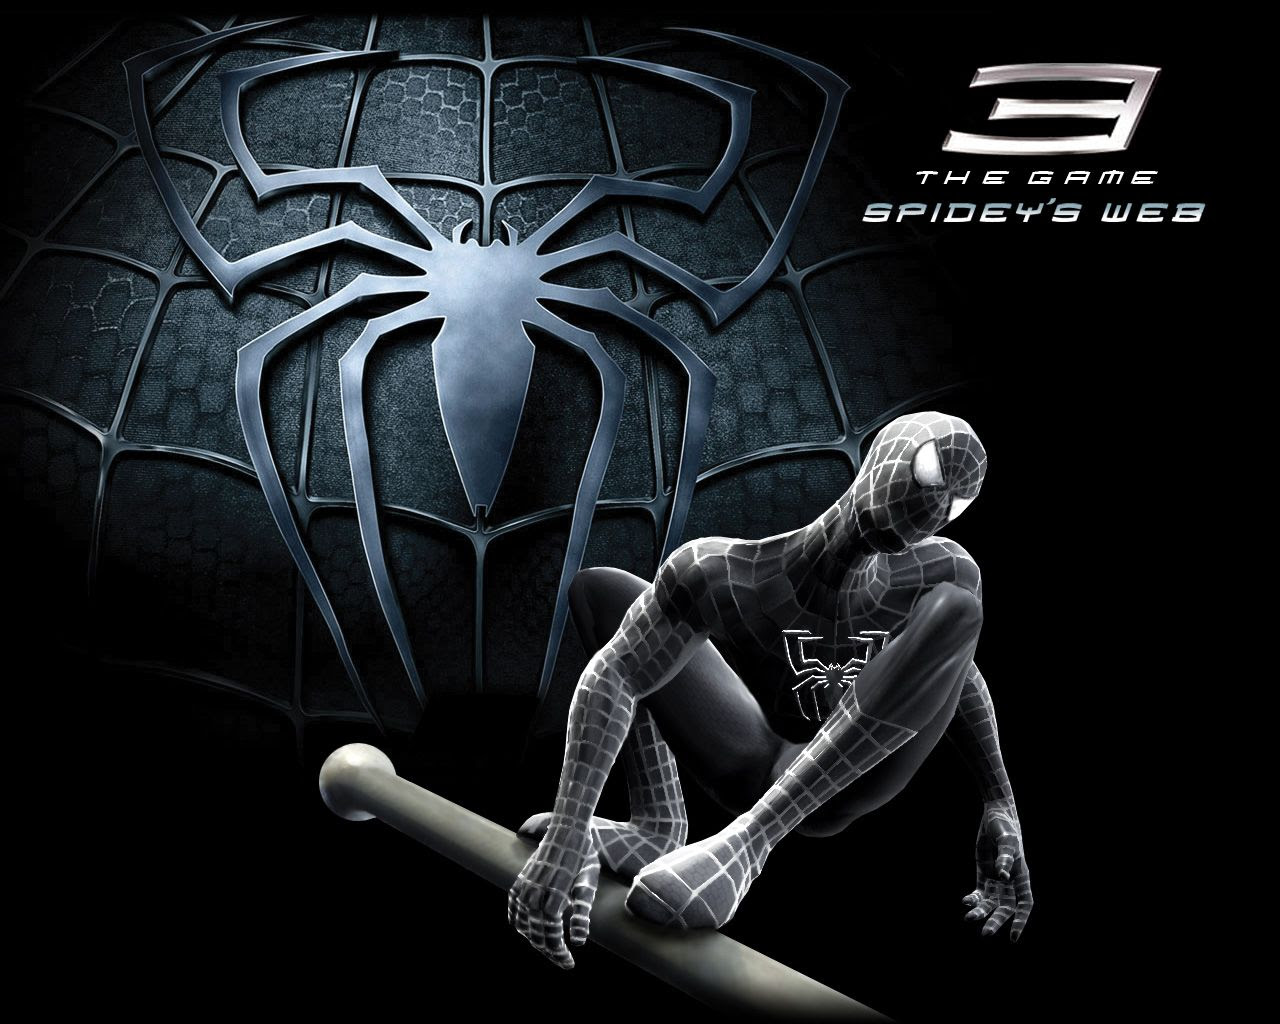 The Amazing Spider Man Wallpaper Hd 1280x1024